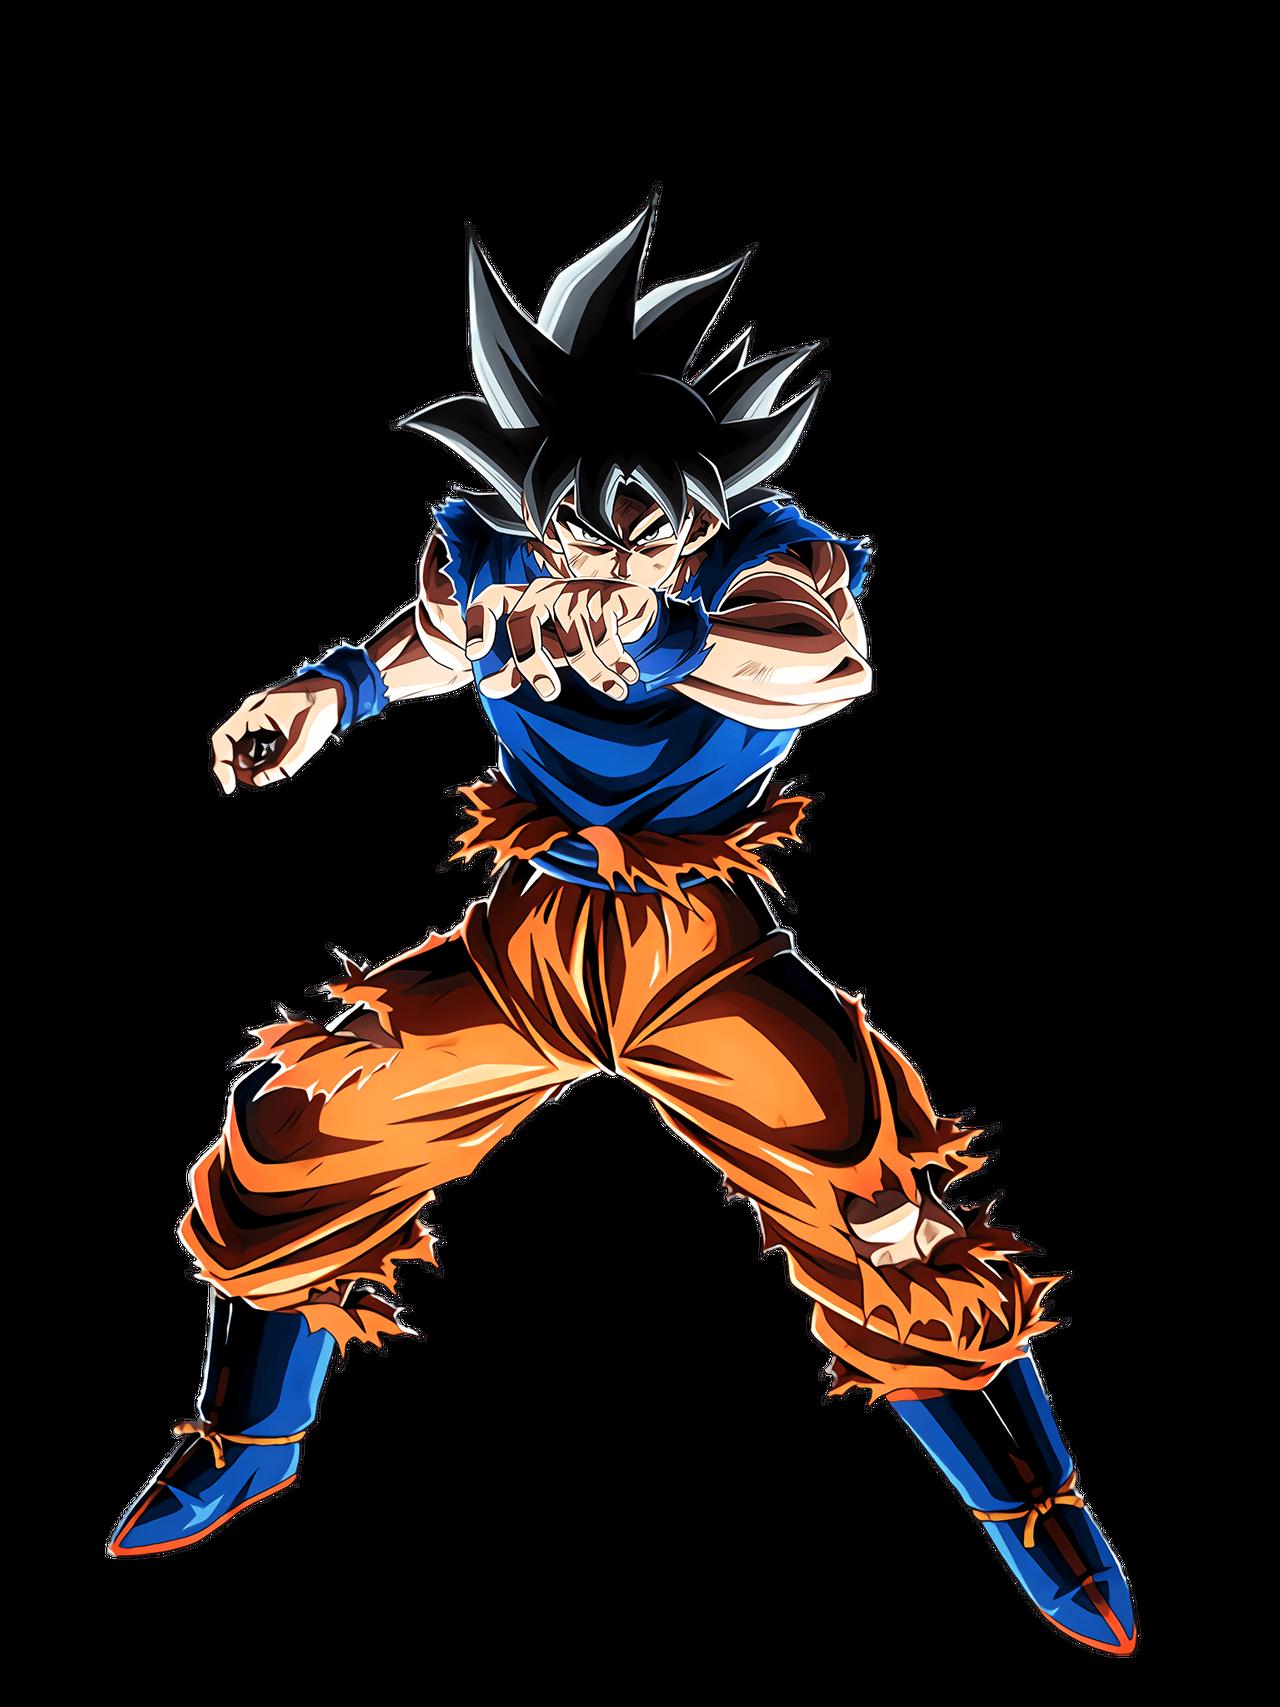 Ultra Instinct Omen Goku Dokkan Battle Card Render By Princeofdbzgames On Deviantart Anime Dragon Ball Super Dragon Ball Super Goku Dragon Ball Super